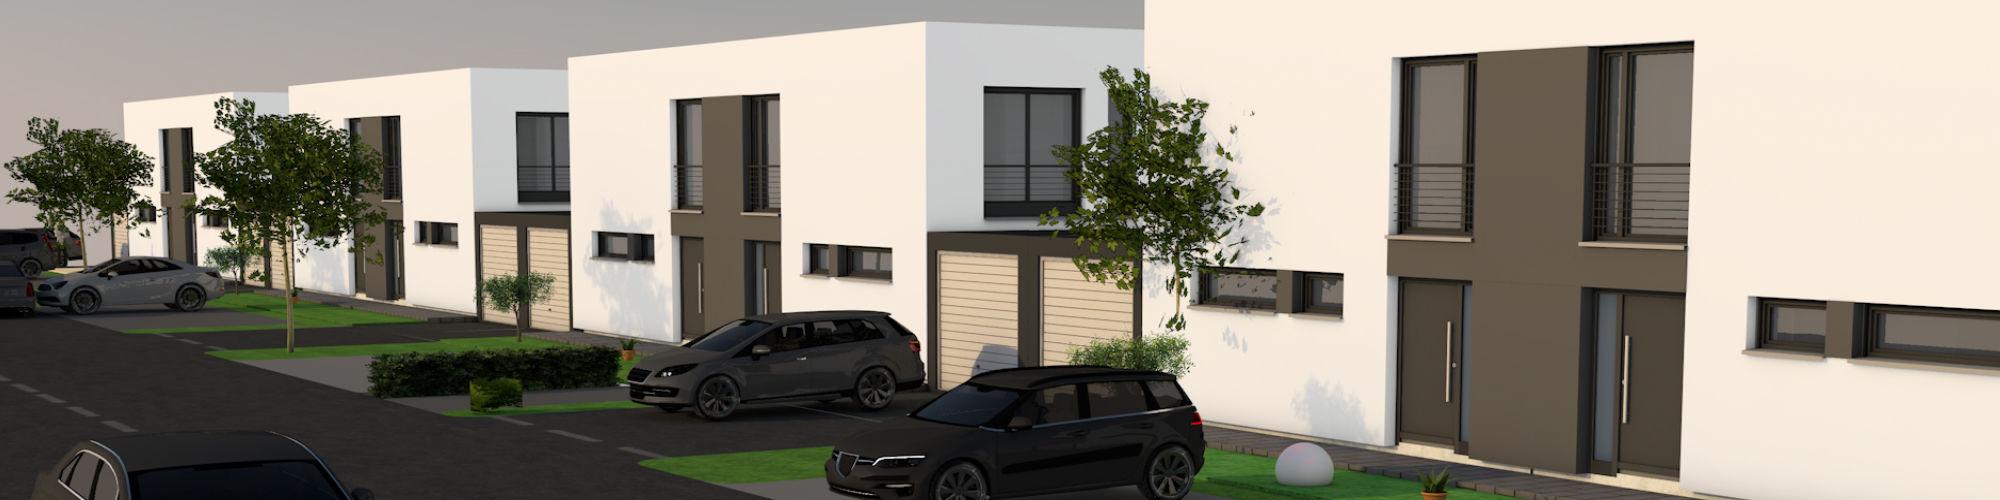 neubauprojekt dortmund ph nixsee weidenbach immobilien. Black Bedroom Furniture Sets. Home Design Ideas